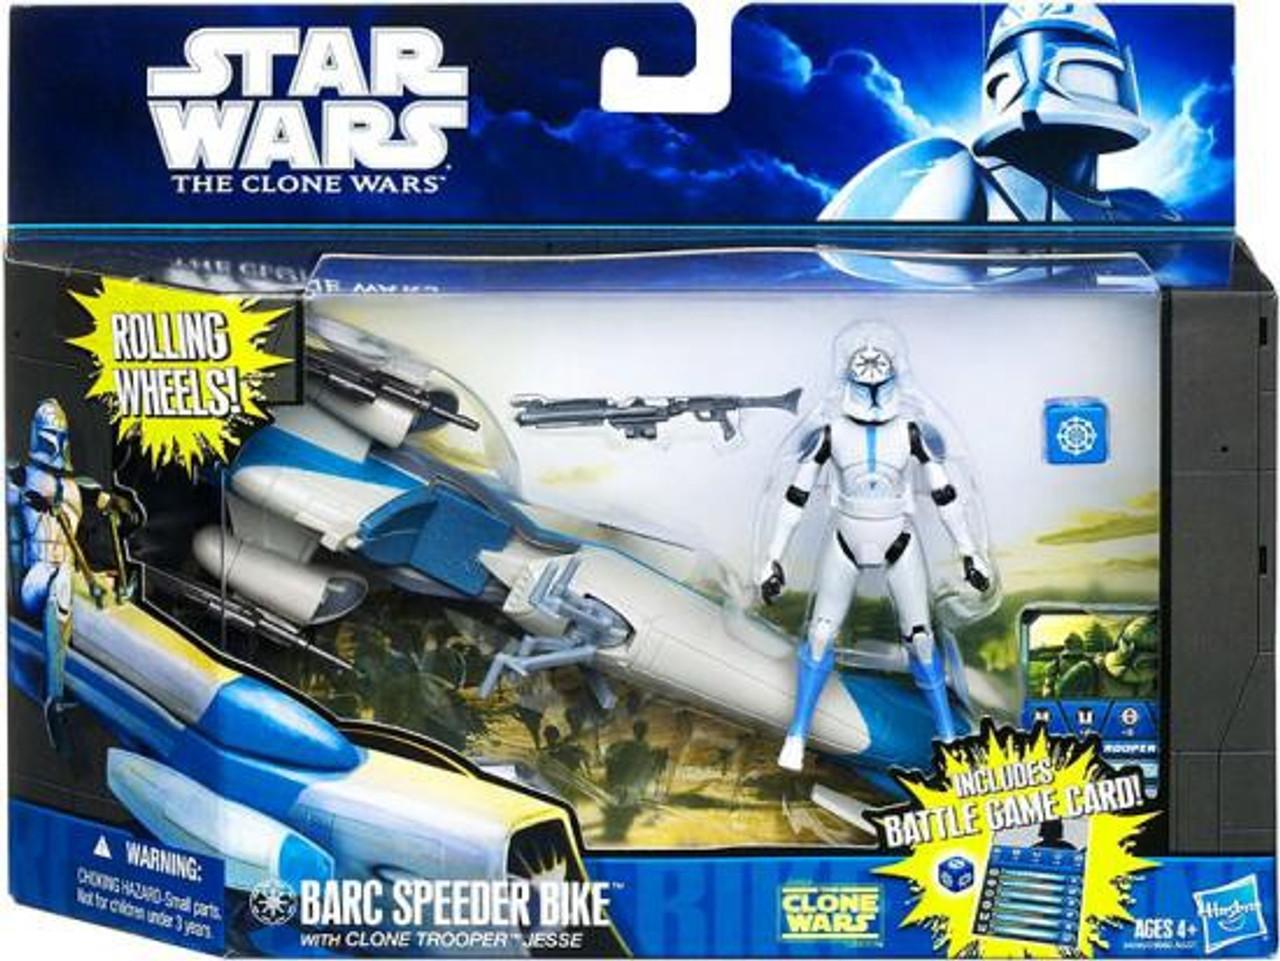 Star Wars The Clone Wars Barc Speeder Bike with Clone Trooper Jesse Vehicle & Action Figure